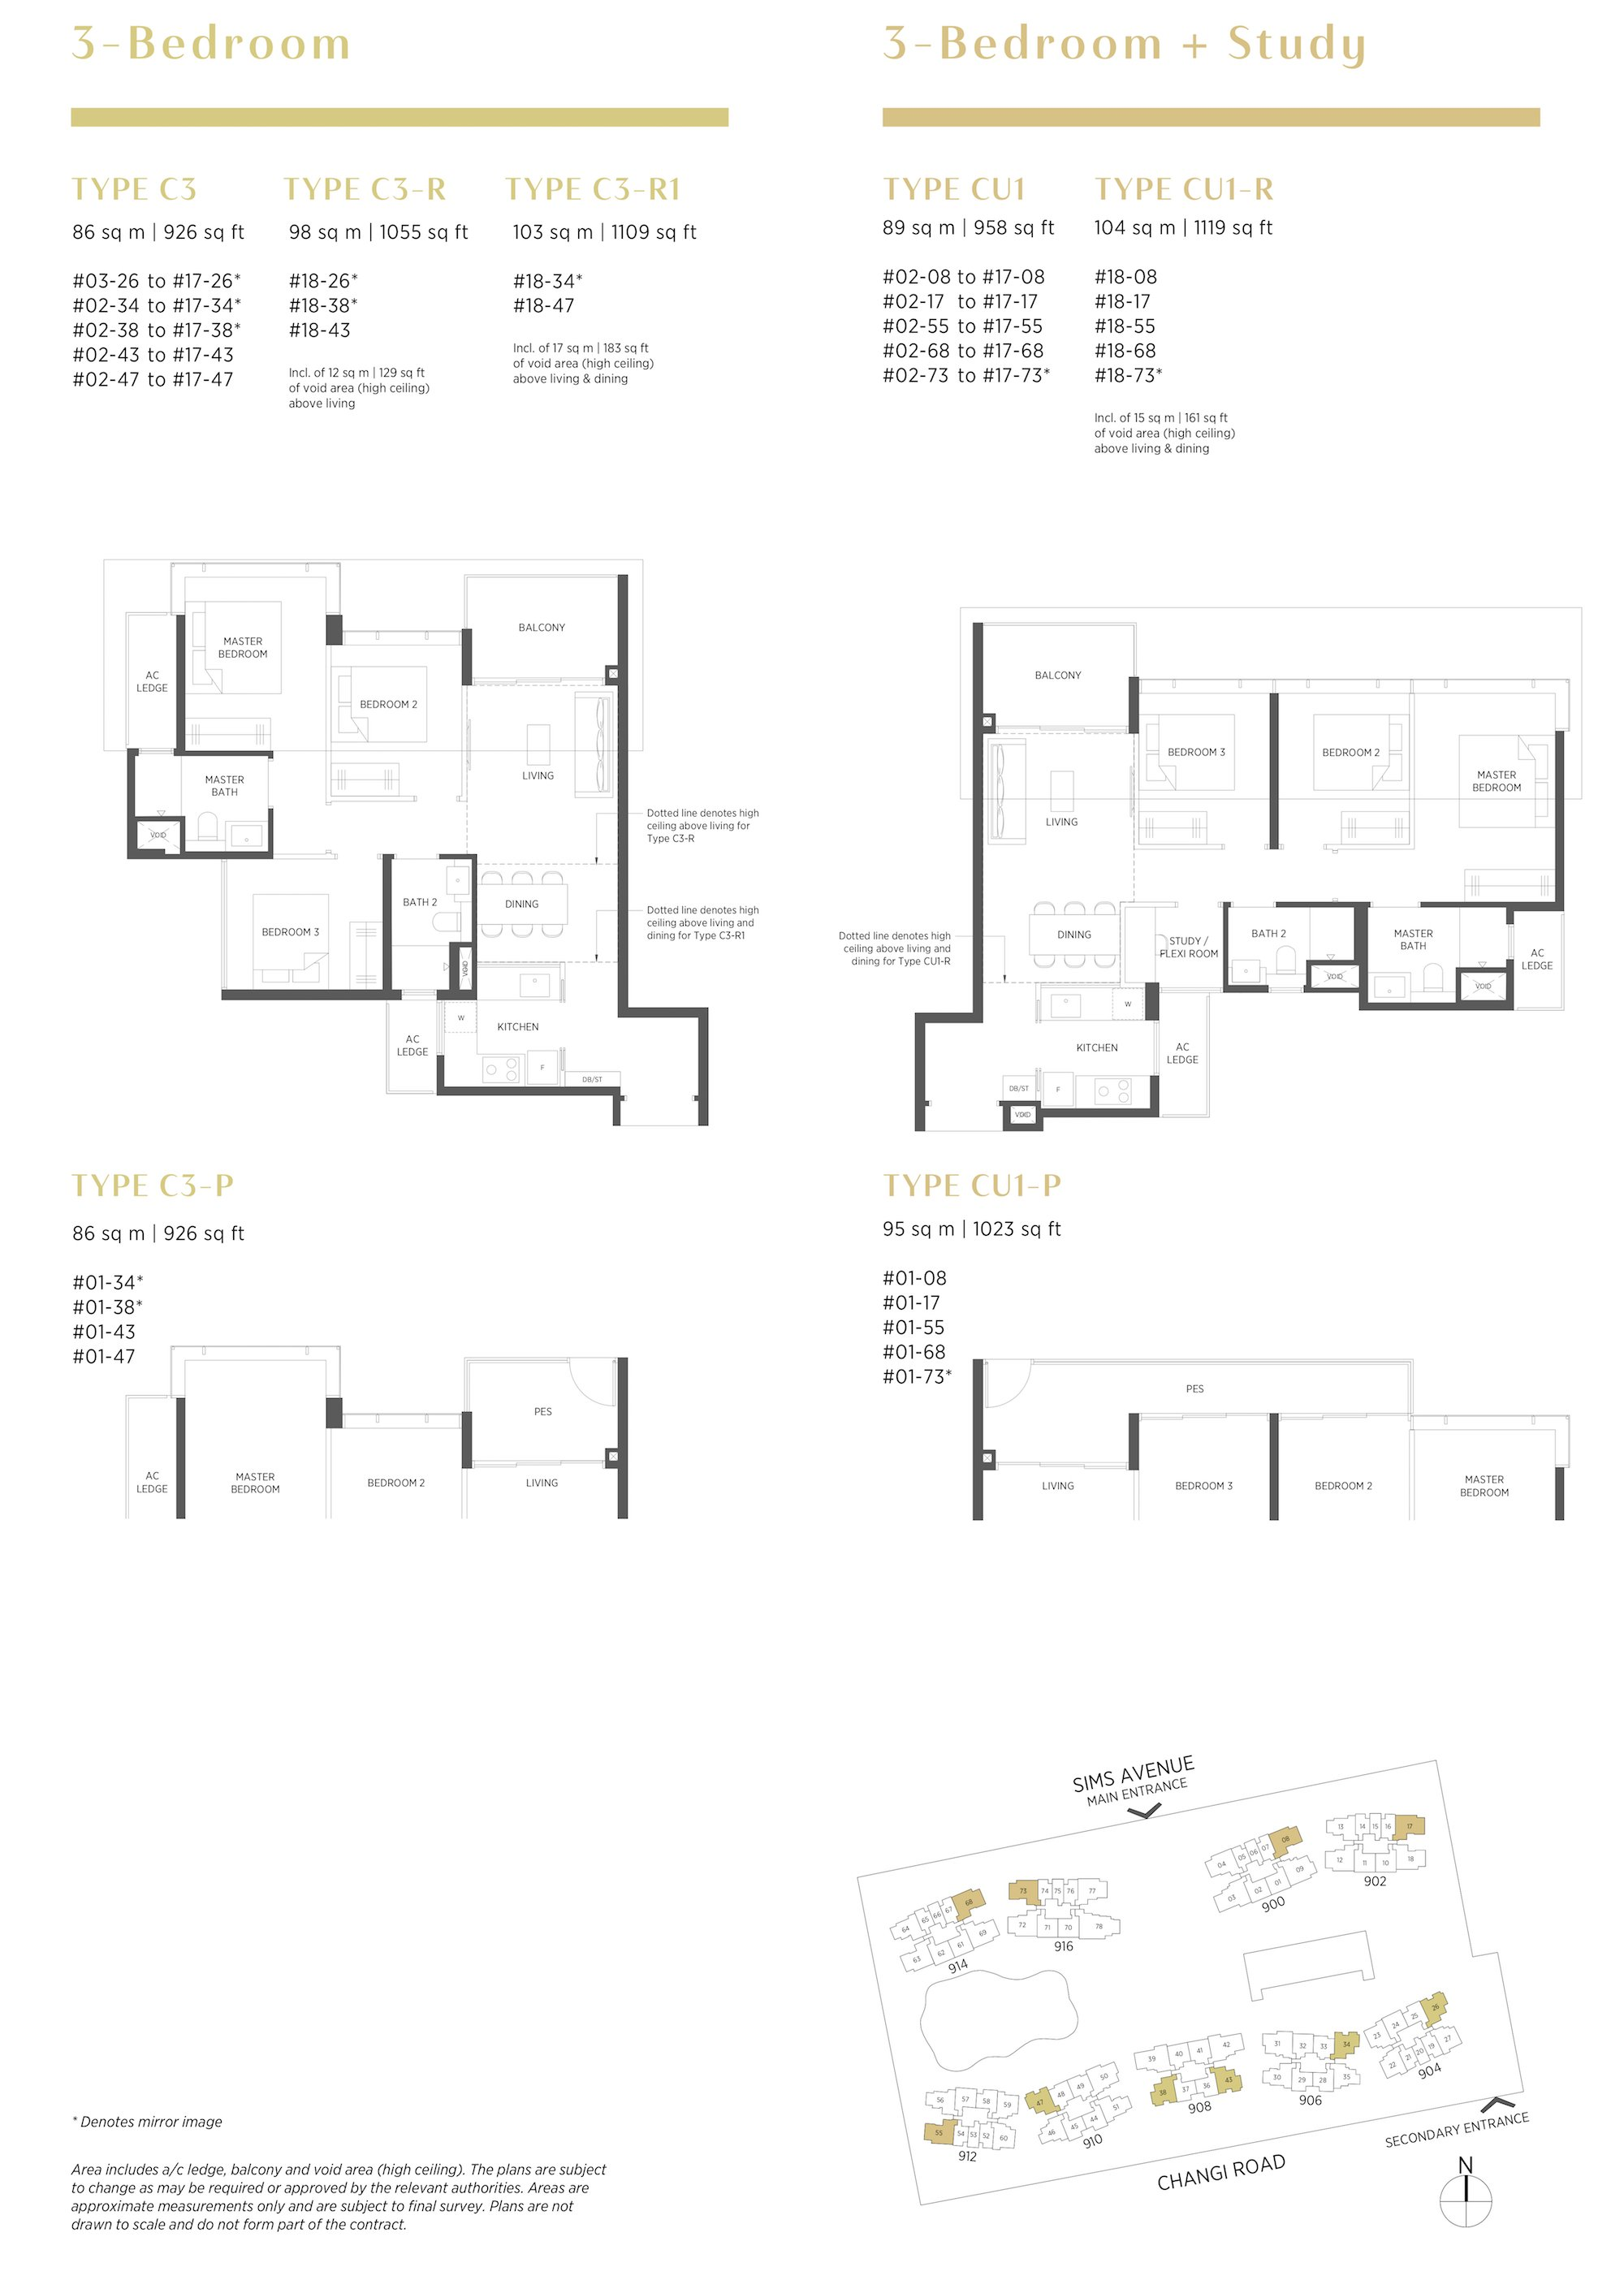 Parc Esta 东景苑 3 bedroom -书房 3卧房-书房 C3 CU1